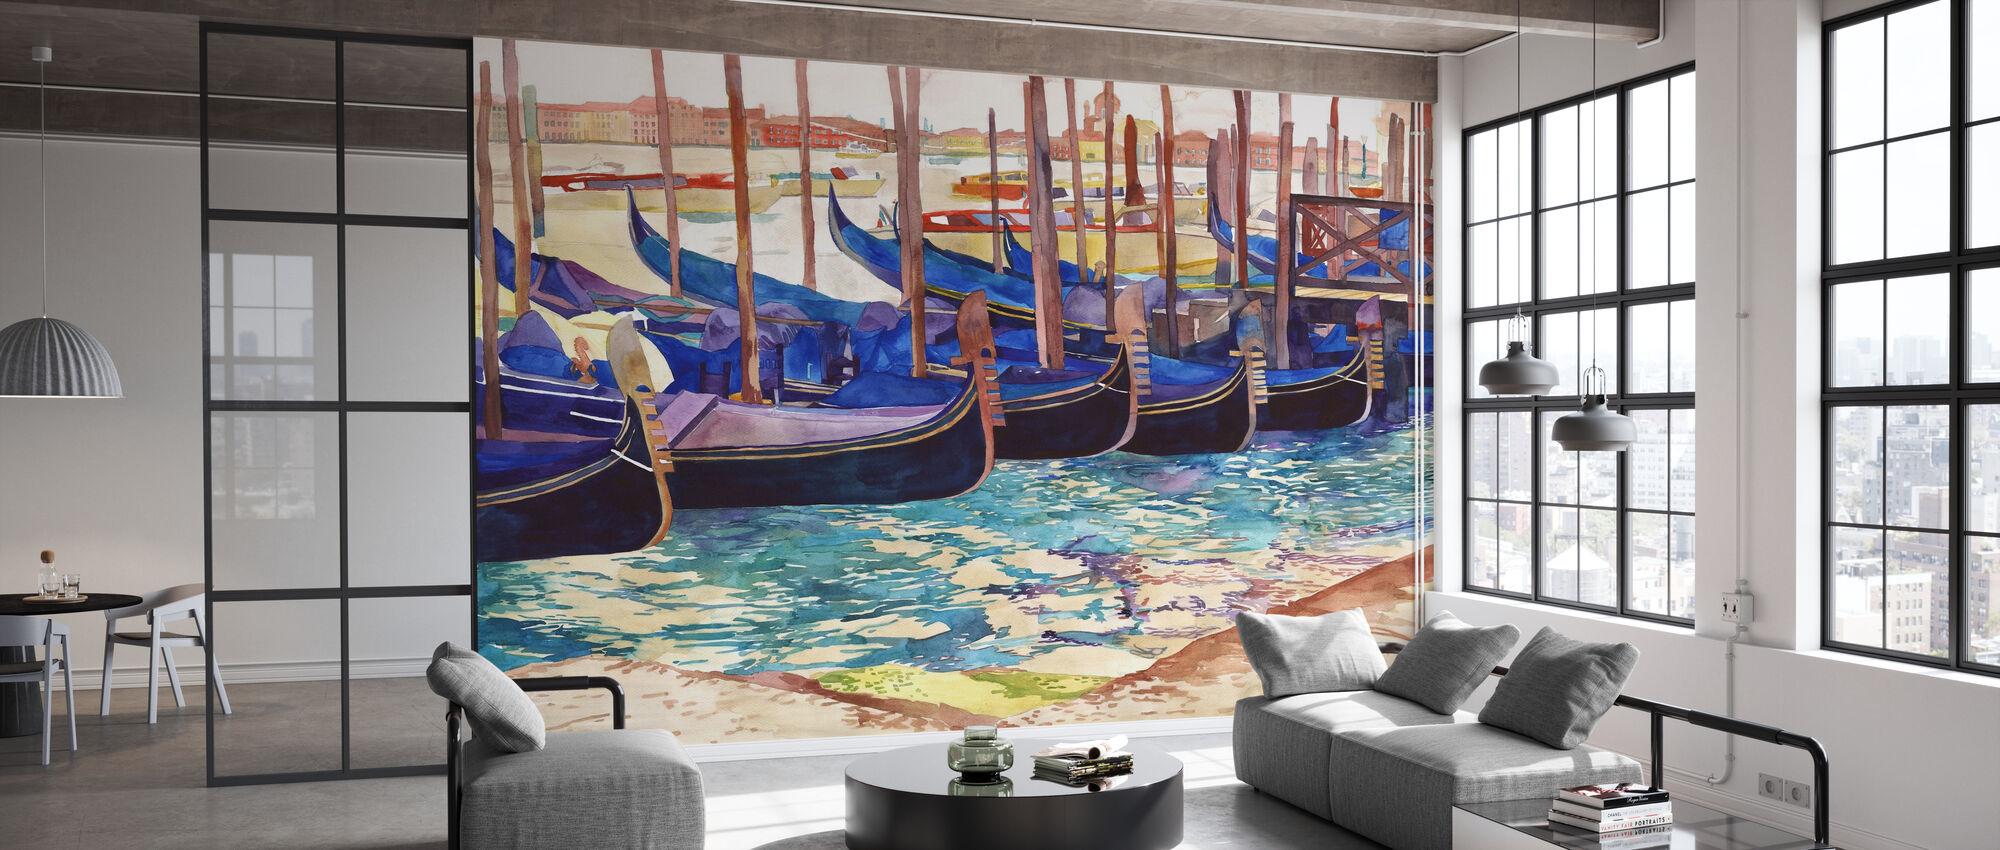 Gondolas in Venice - Wallpaper - Office